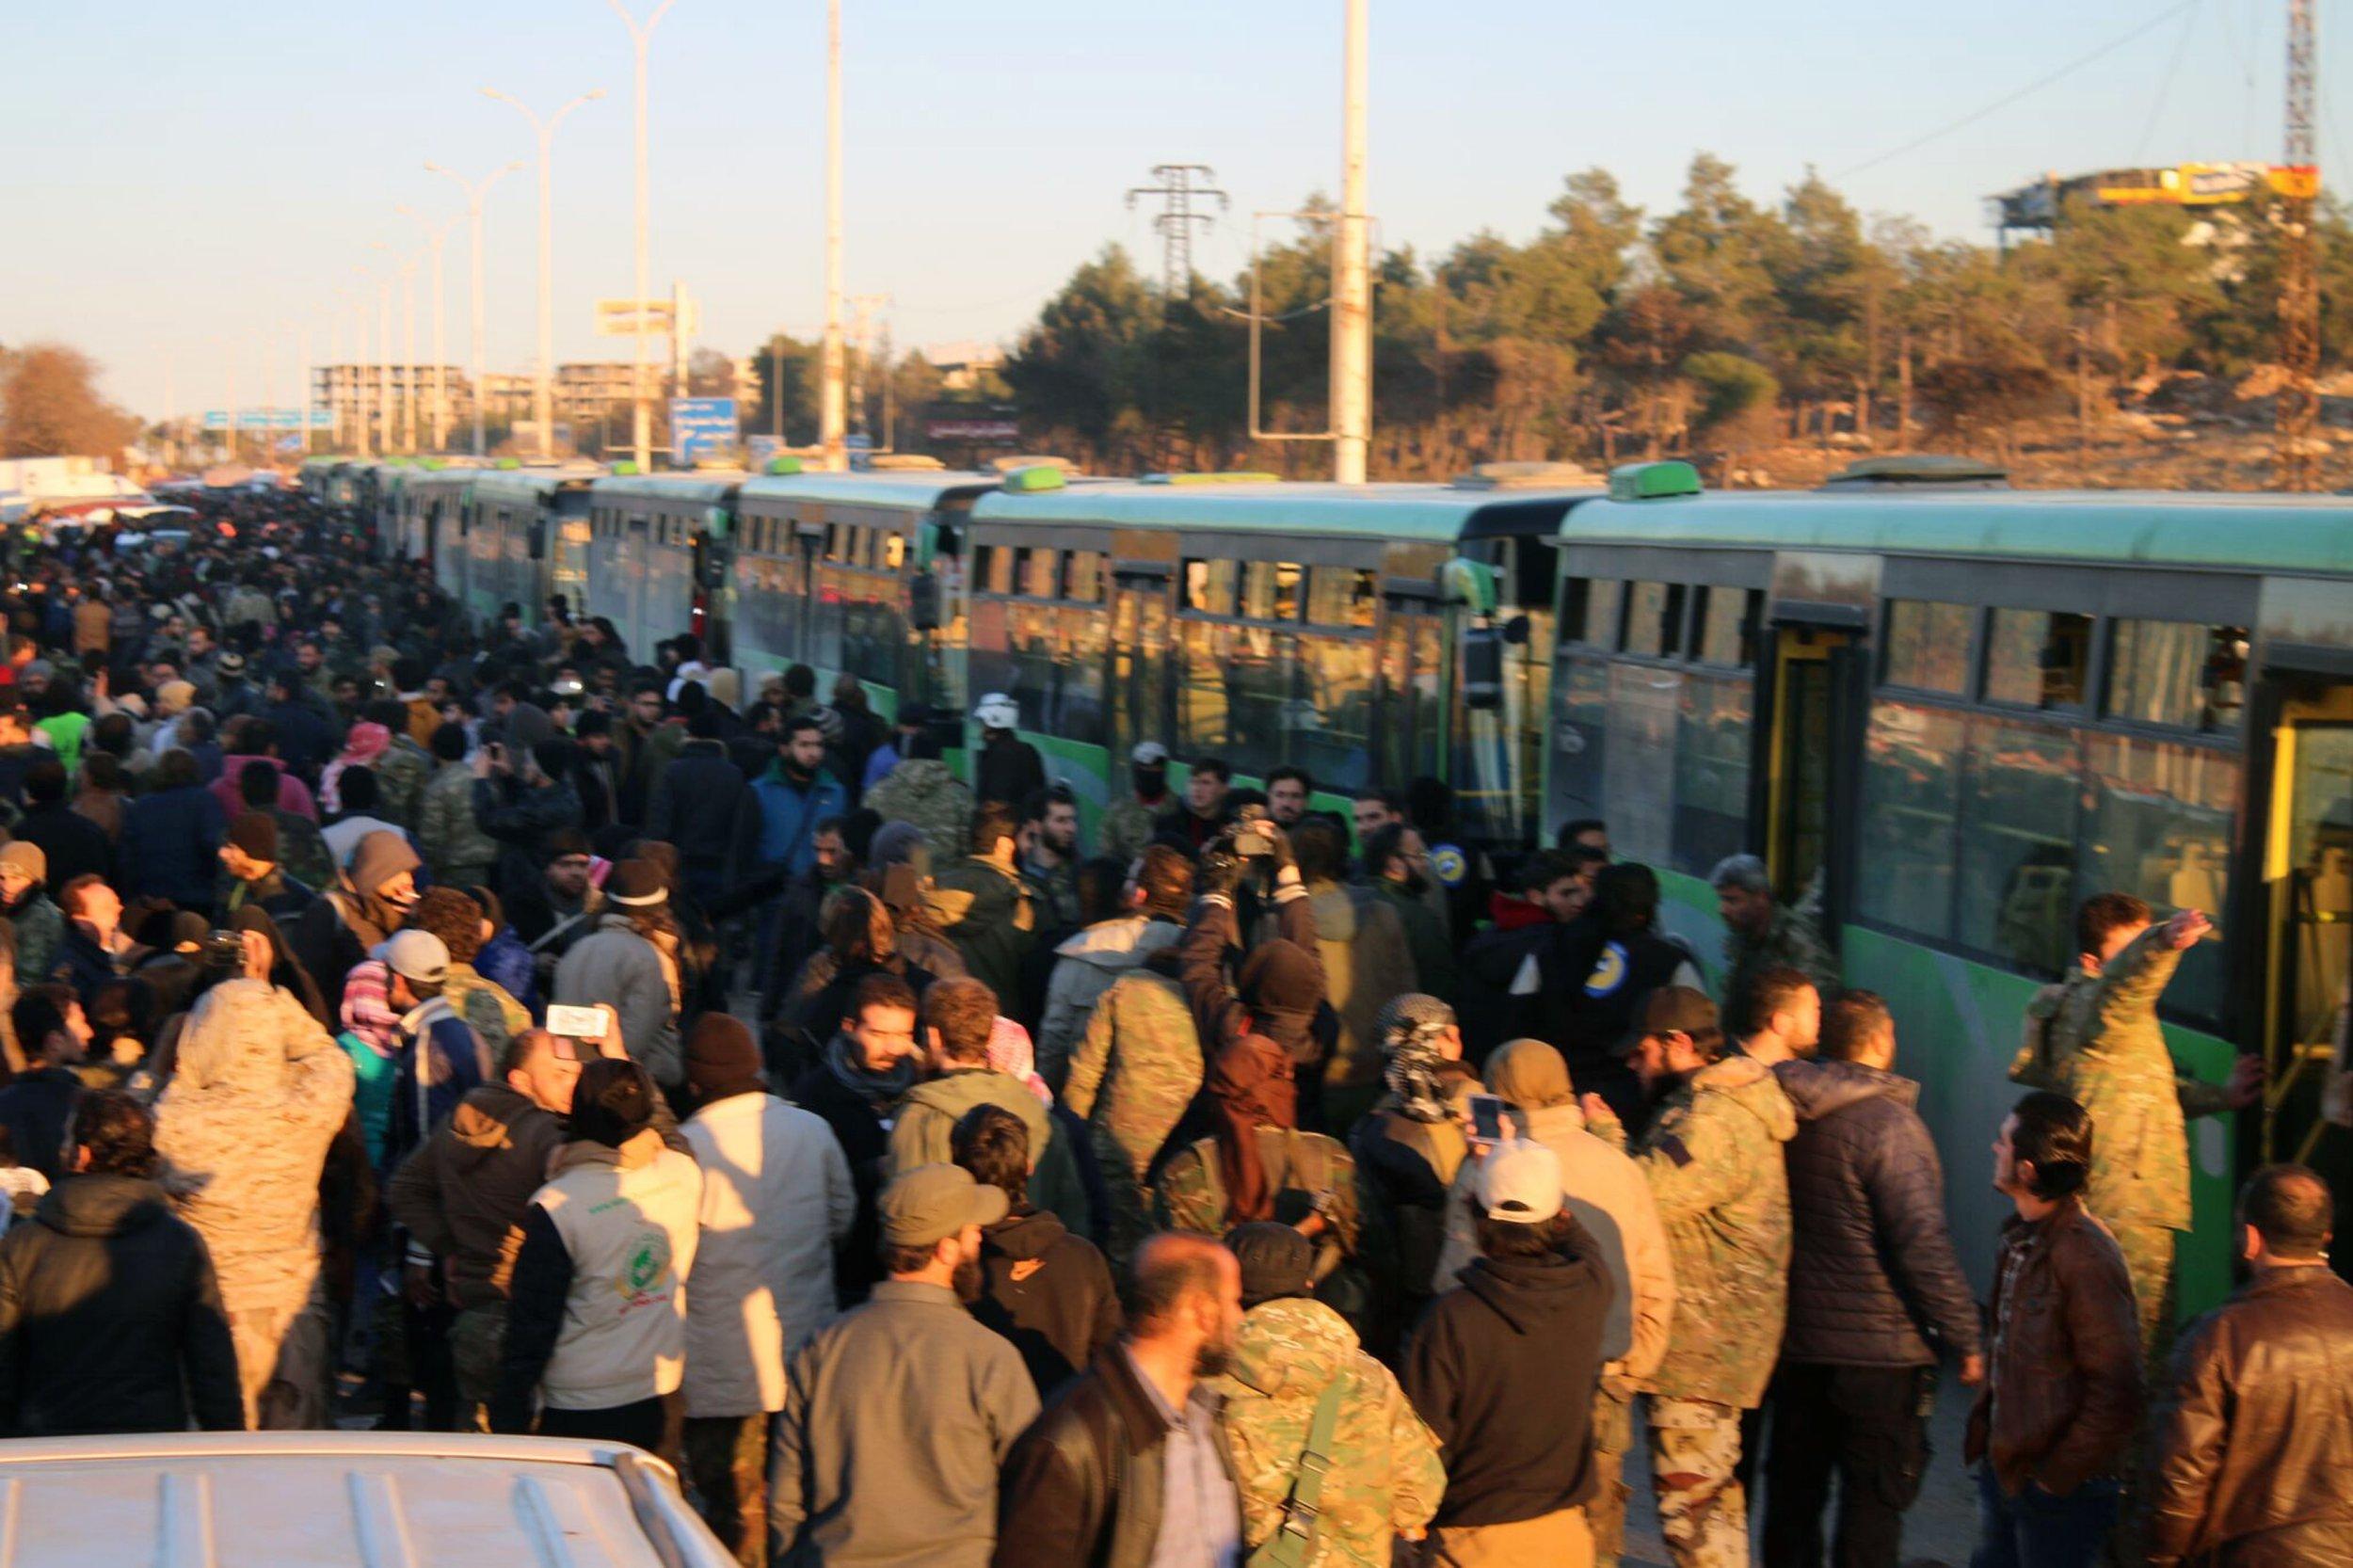 Massive evacuation of Aleppo 'grinds to a halt'